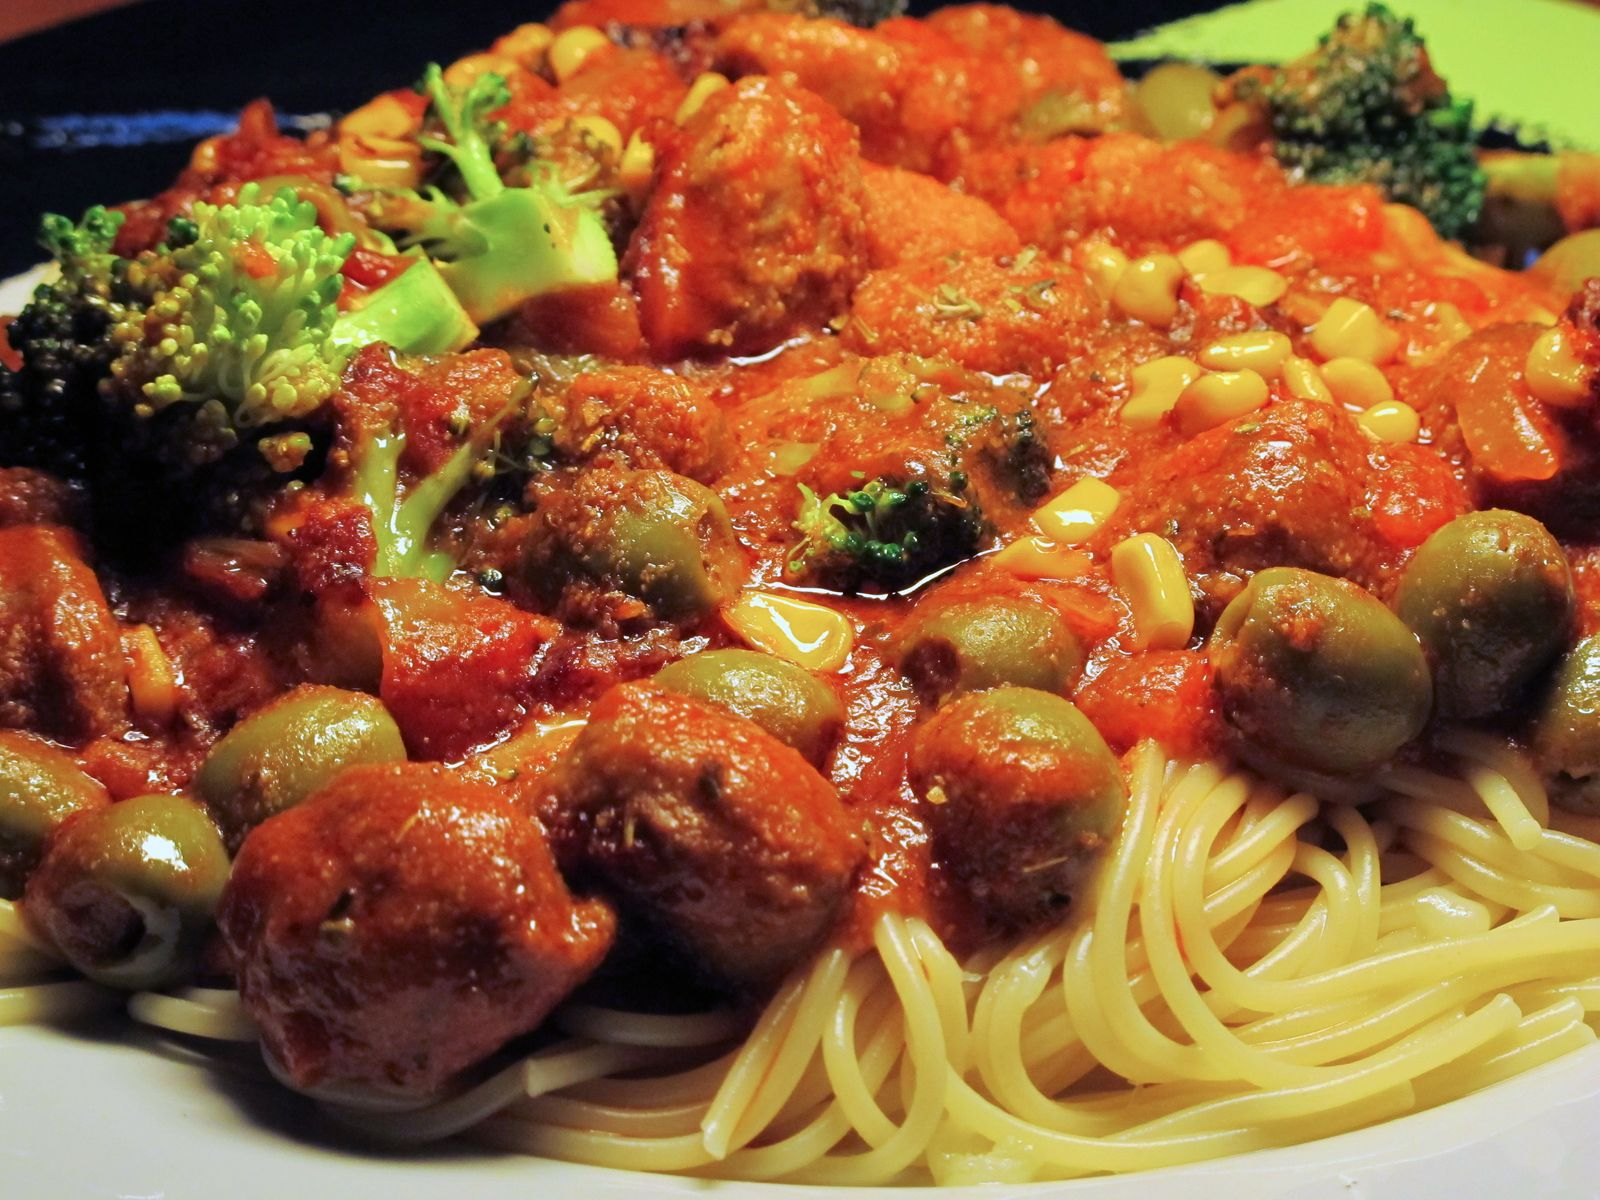 Spaghetti Bolognese a la Jan.